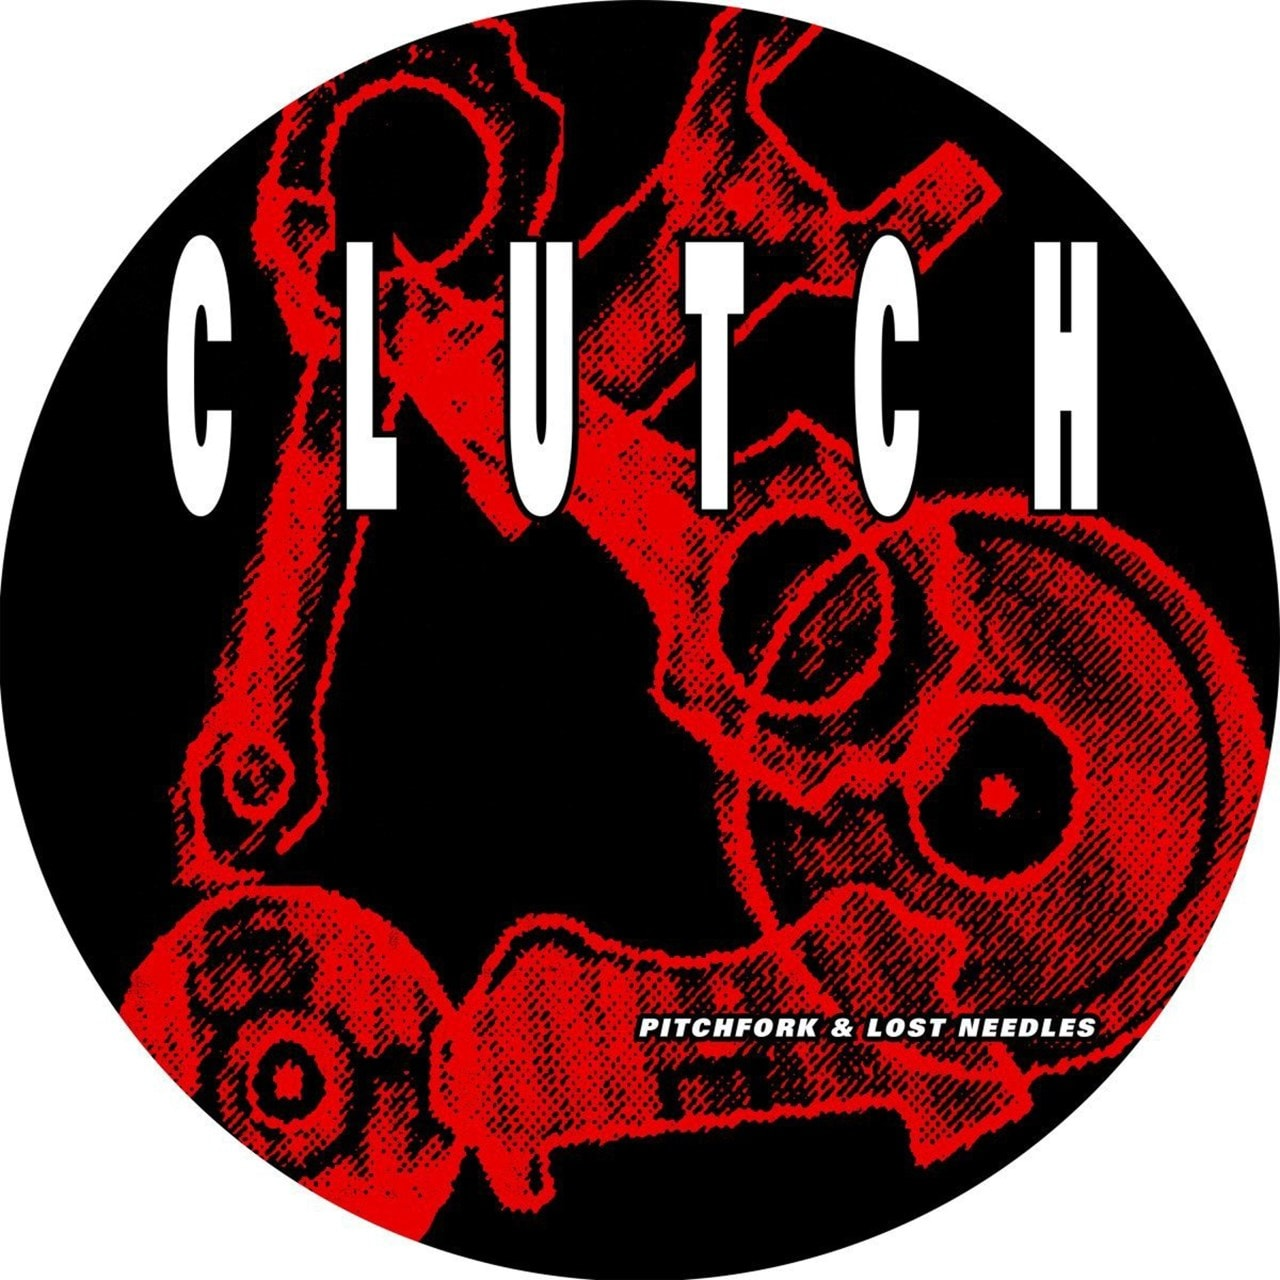 Pitchfork & Lost Needles - 1